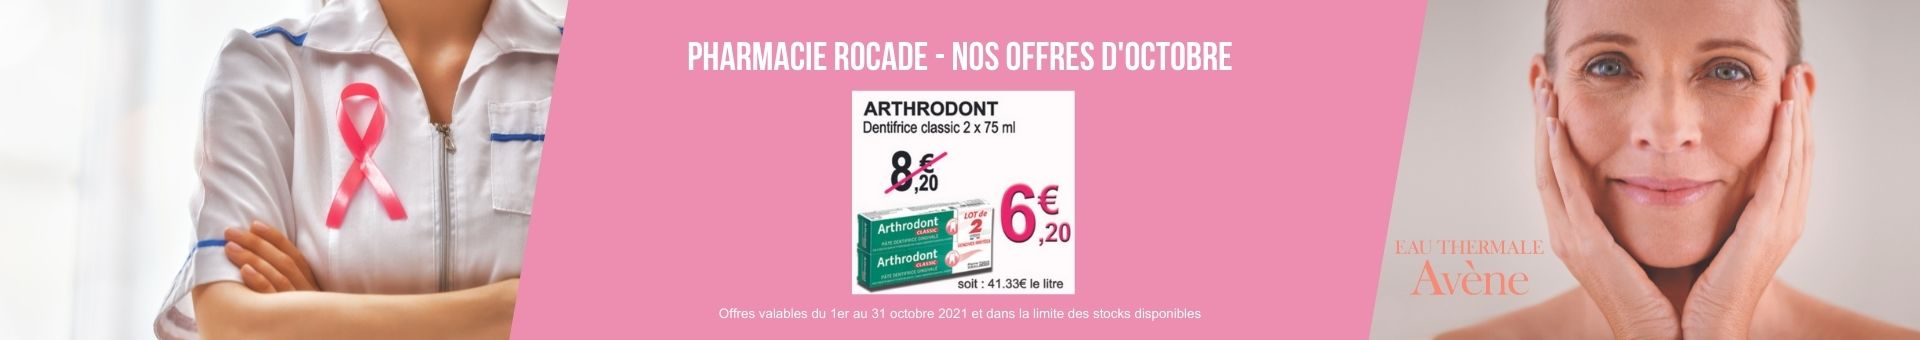 Pharmacie de la Benauge,Bordeaux